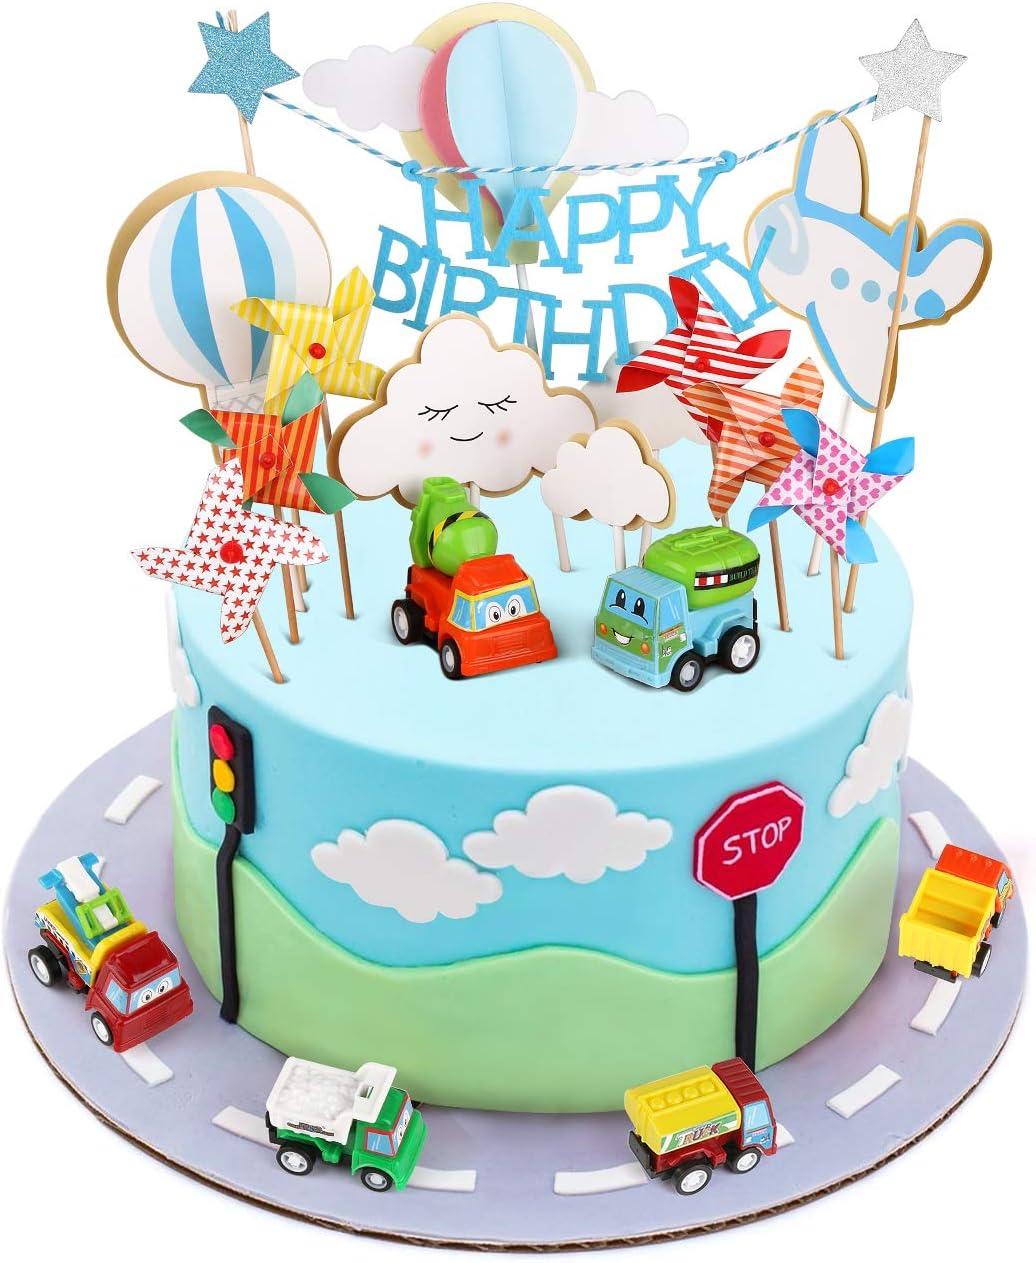 Enjoyable Toy Cars Cake Topper Joyoldelf Happy Birthday Cake Topper Car Funny Birthday Cards Online Alyptdamsfinfo